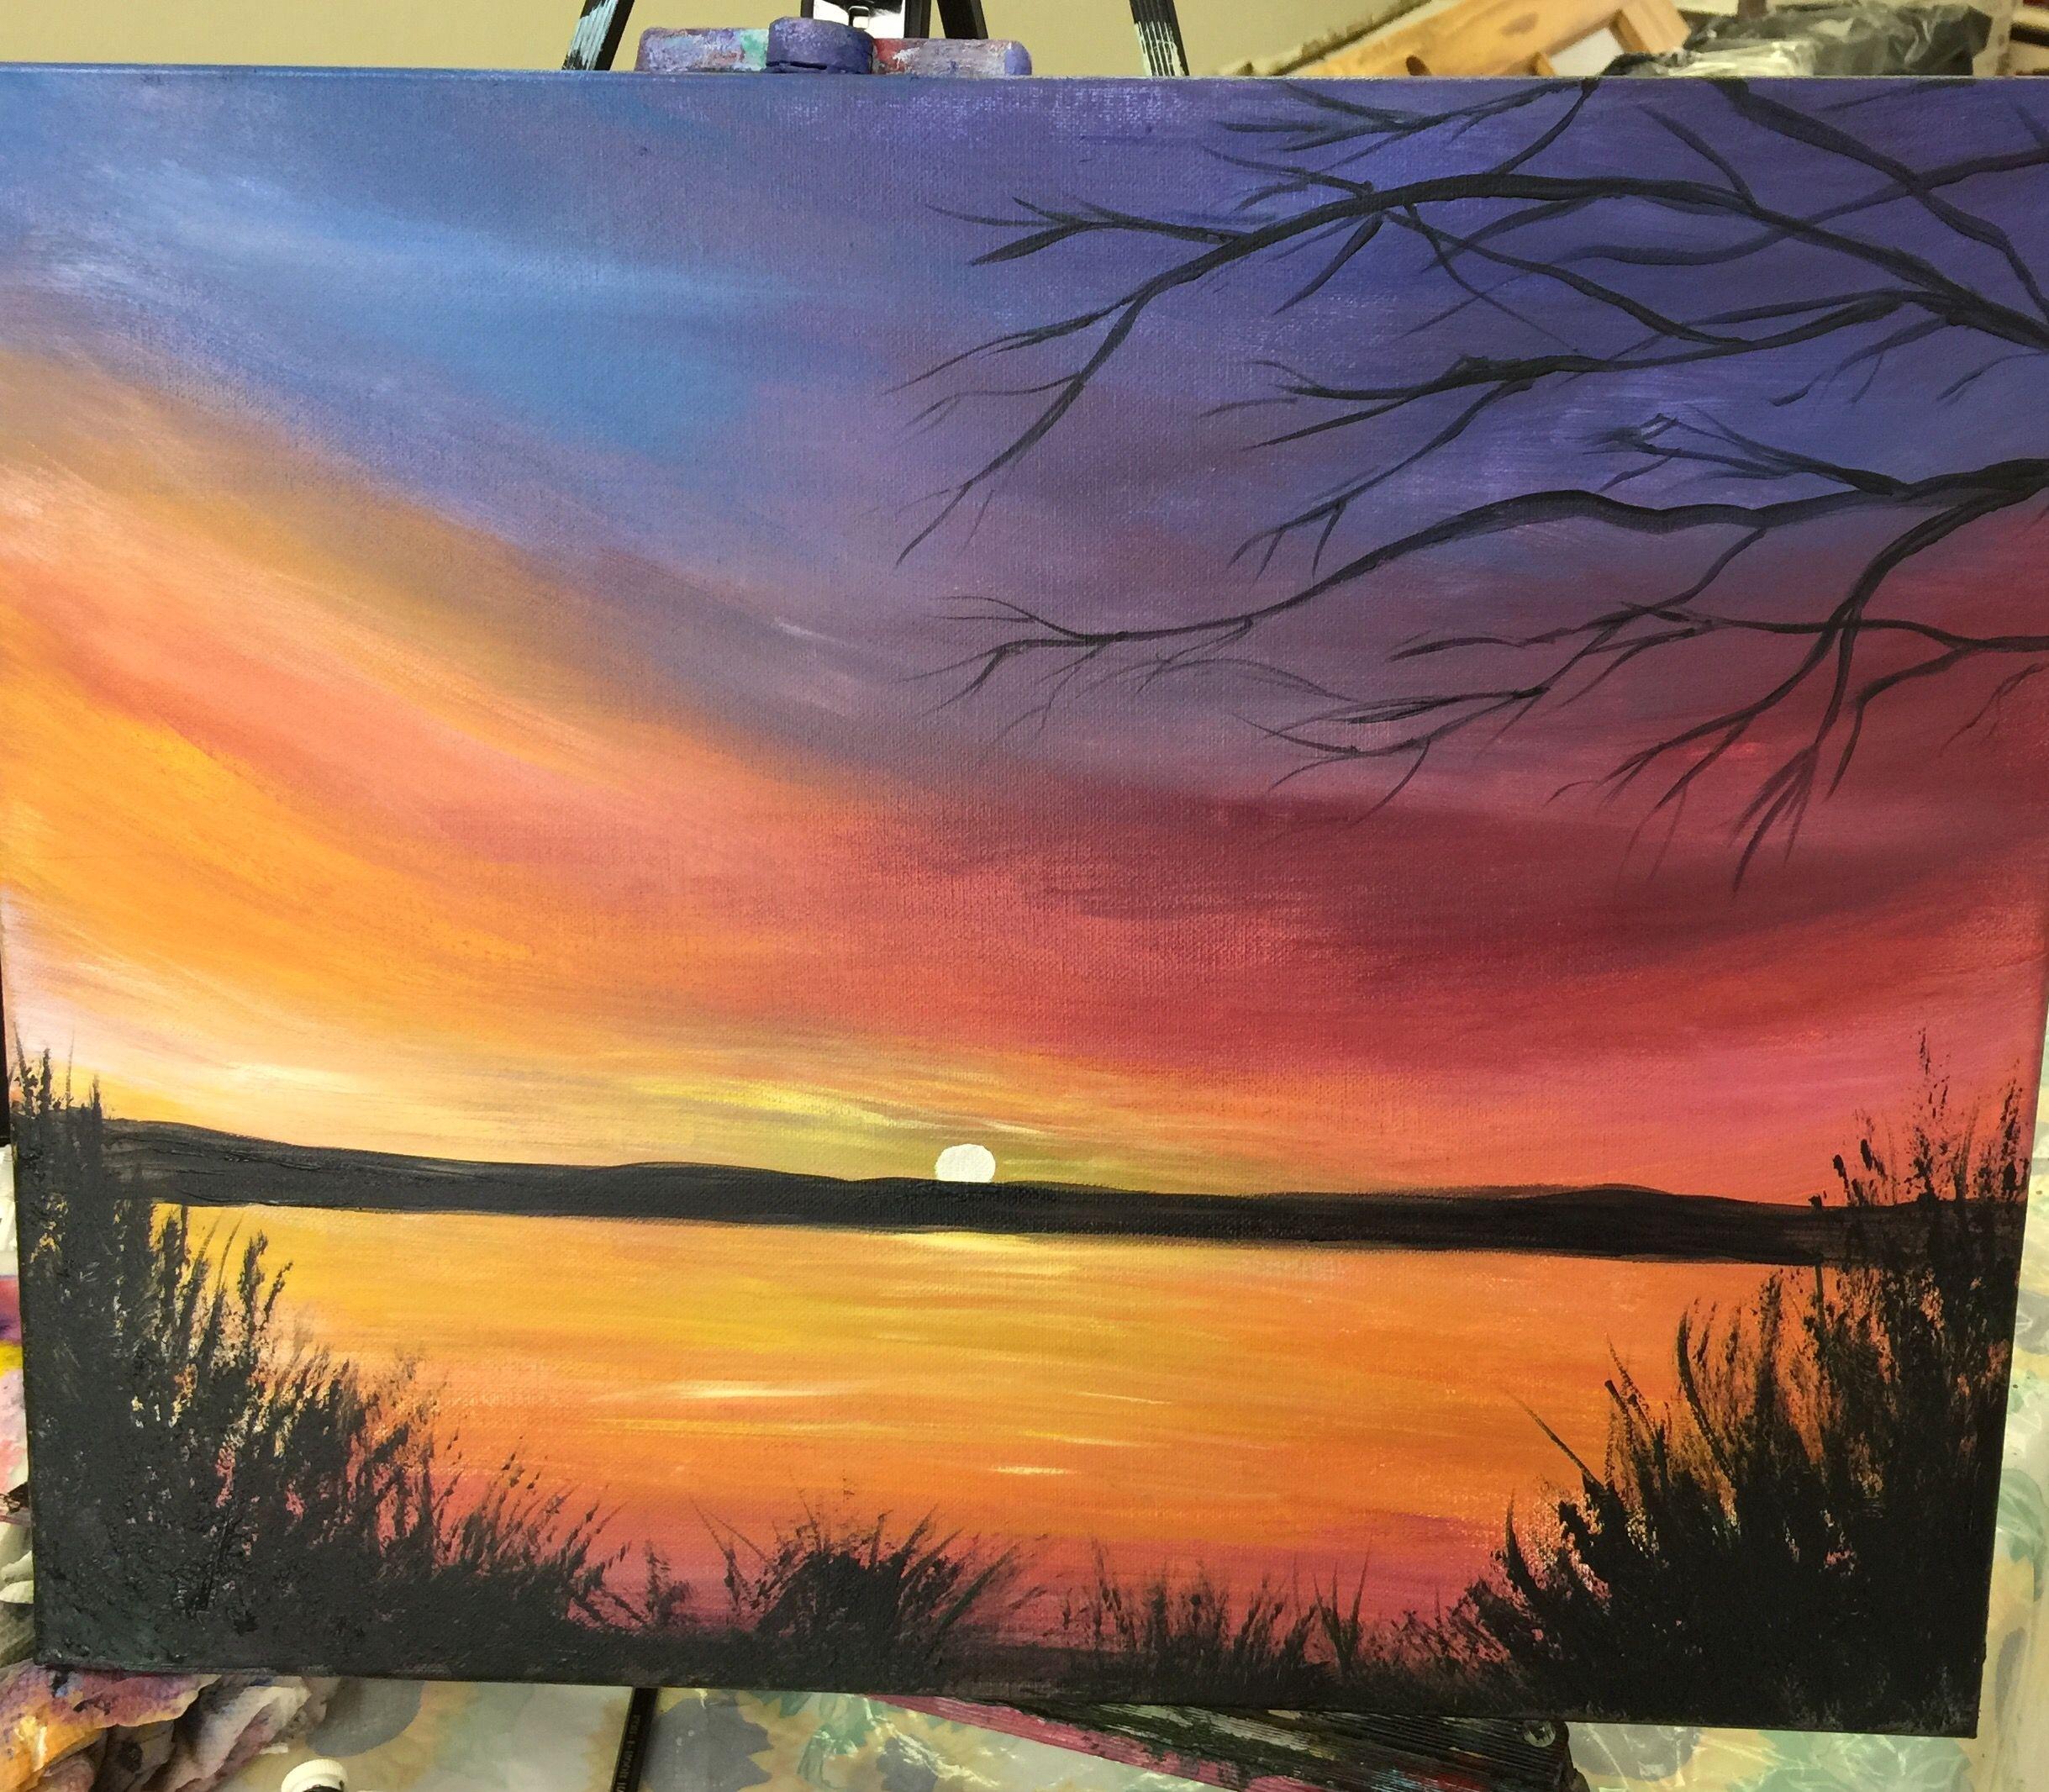 Paint Ideas, Fishing, Board, Peach, Idea Paint